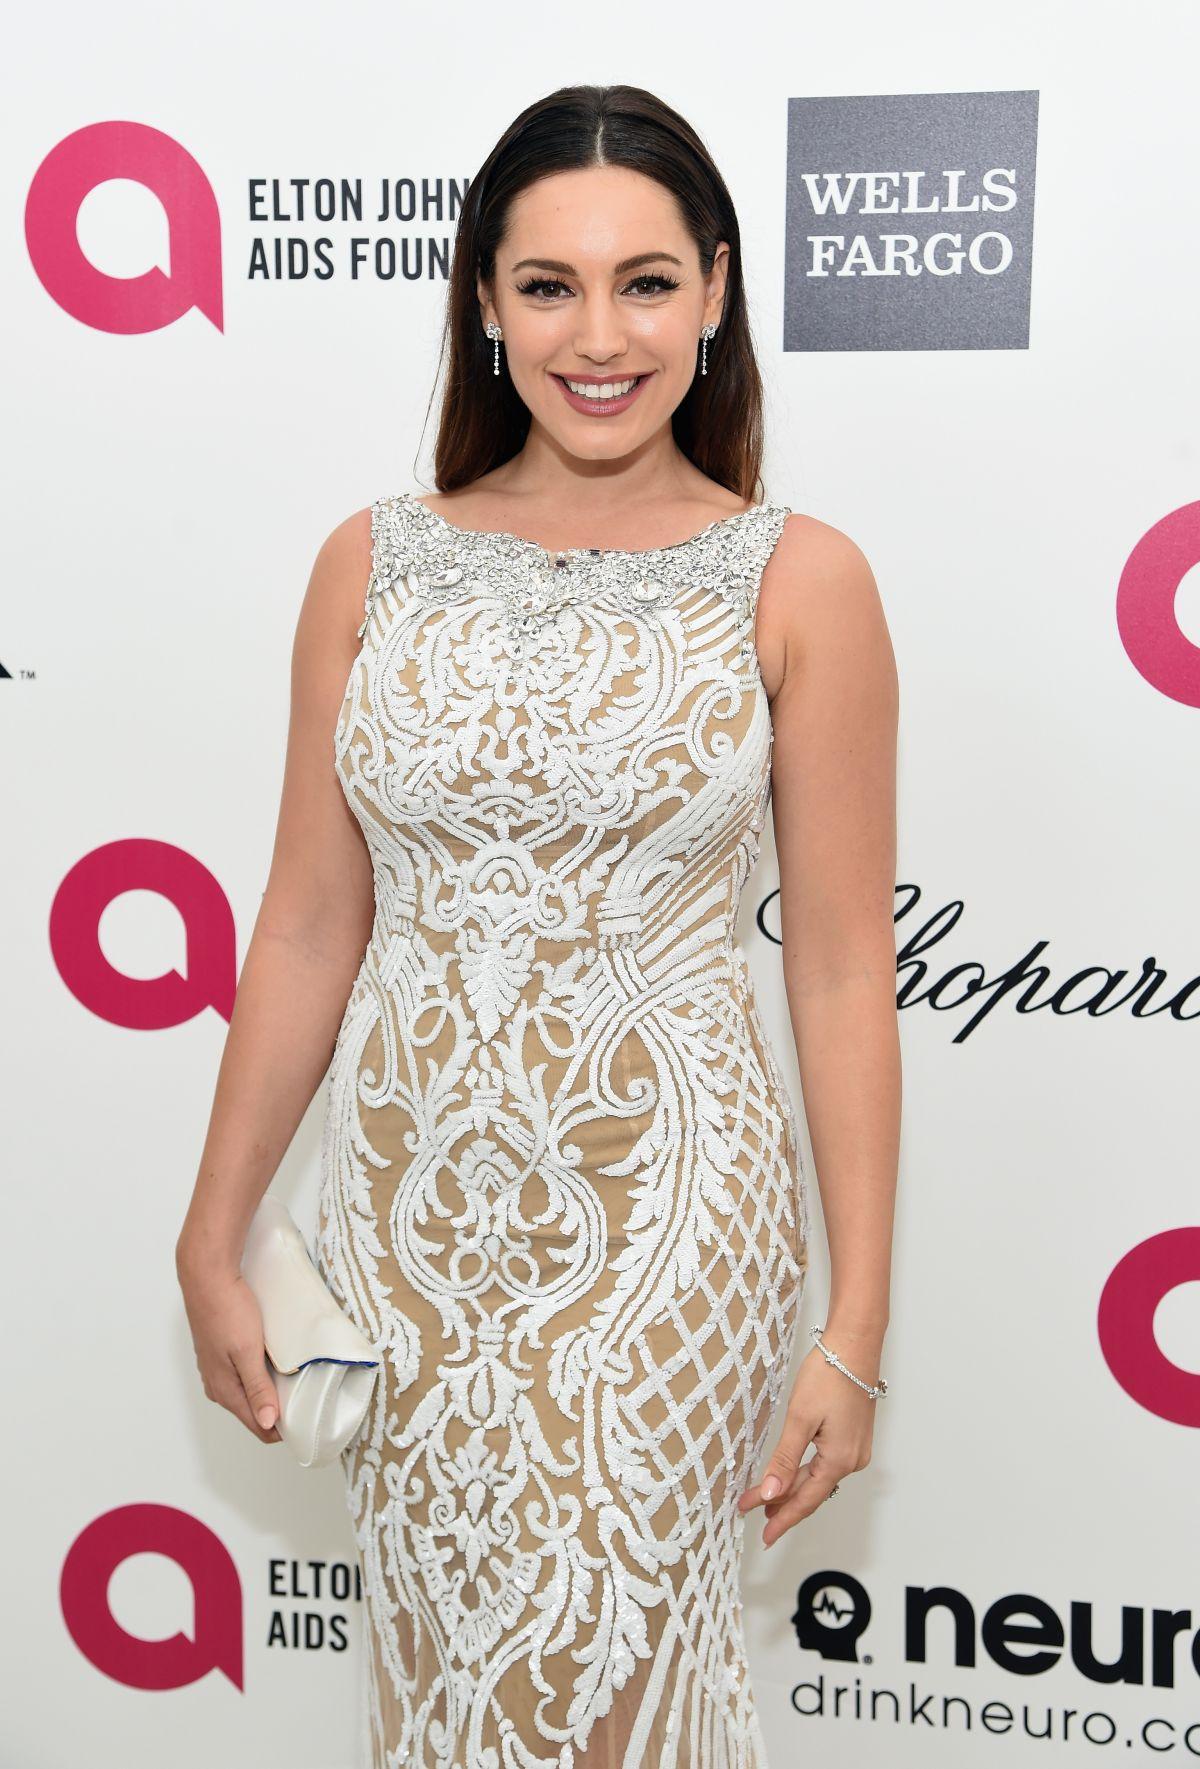 KELLY BROOK at Elton John Aids Foundation's Oscar Viewing Party